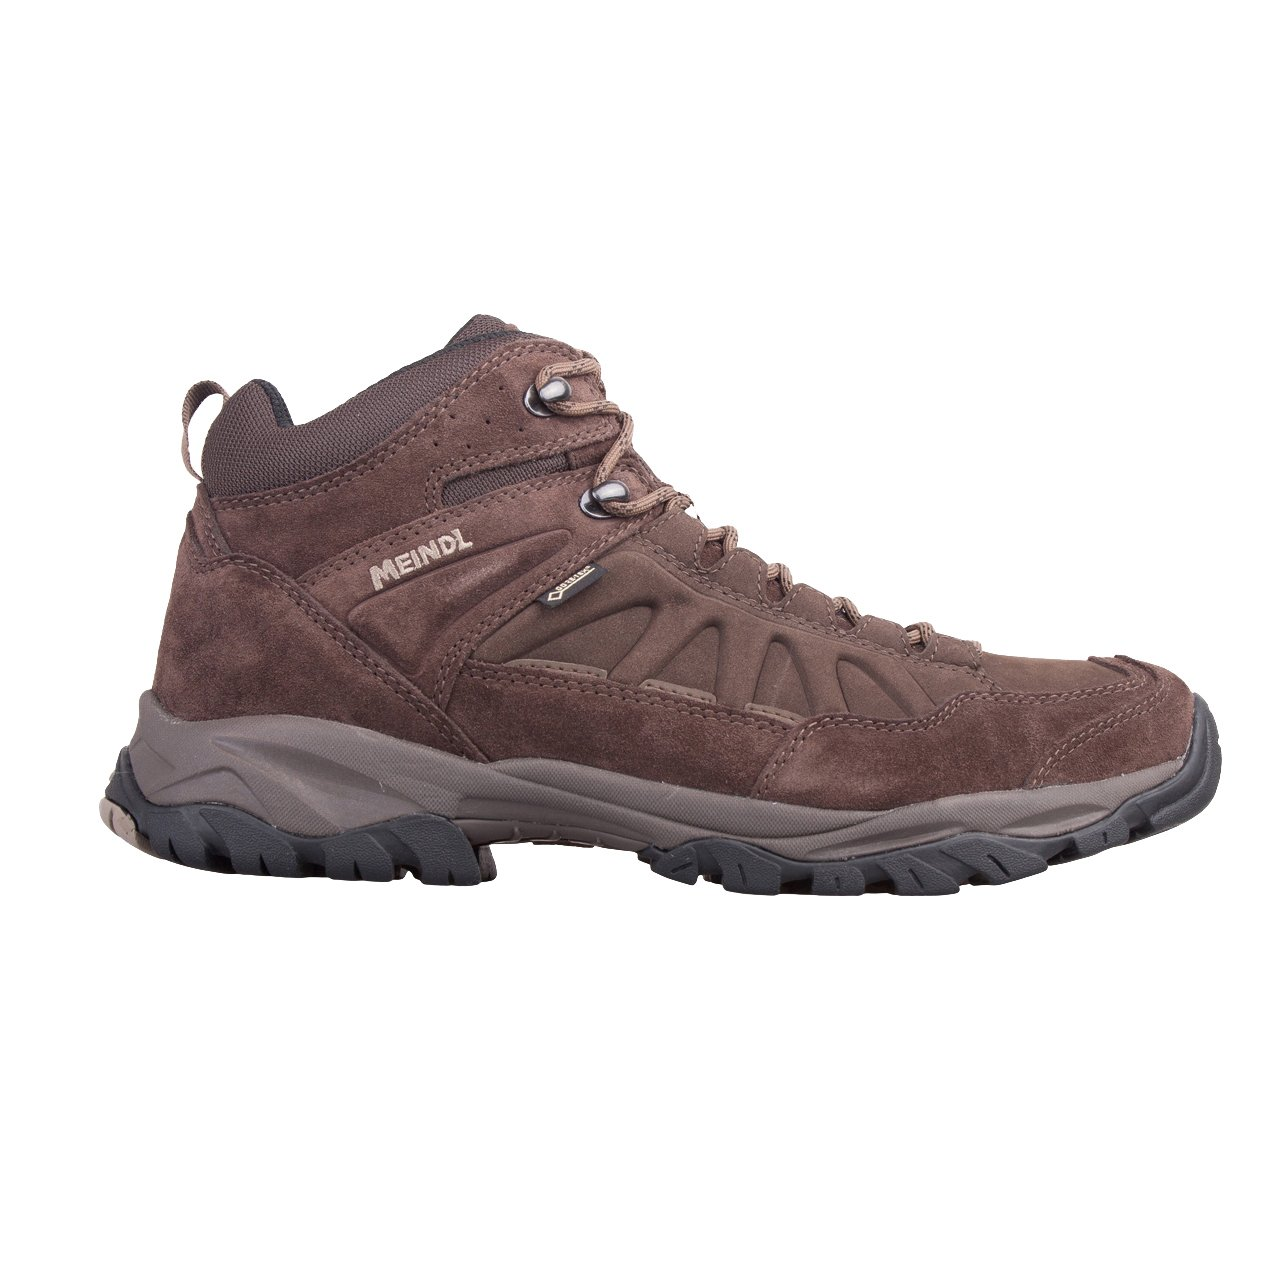 MEINDL Nebraska Mid GTX Zapato de Senderismo Caballero 40|Marr3n